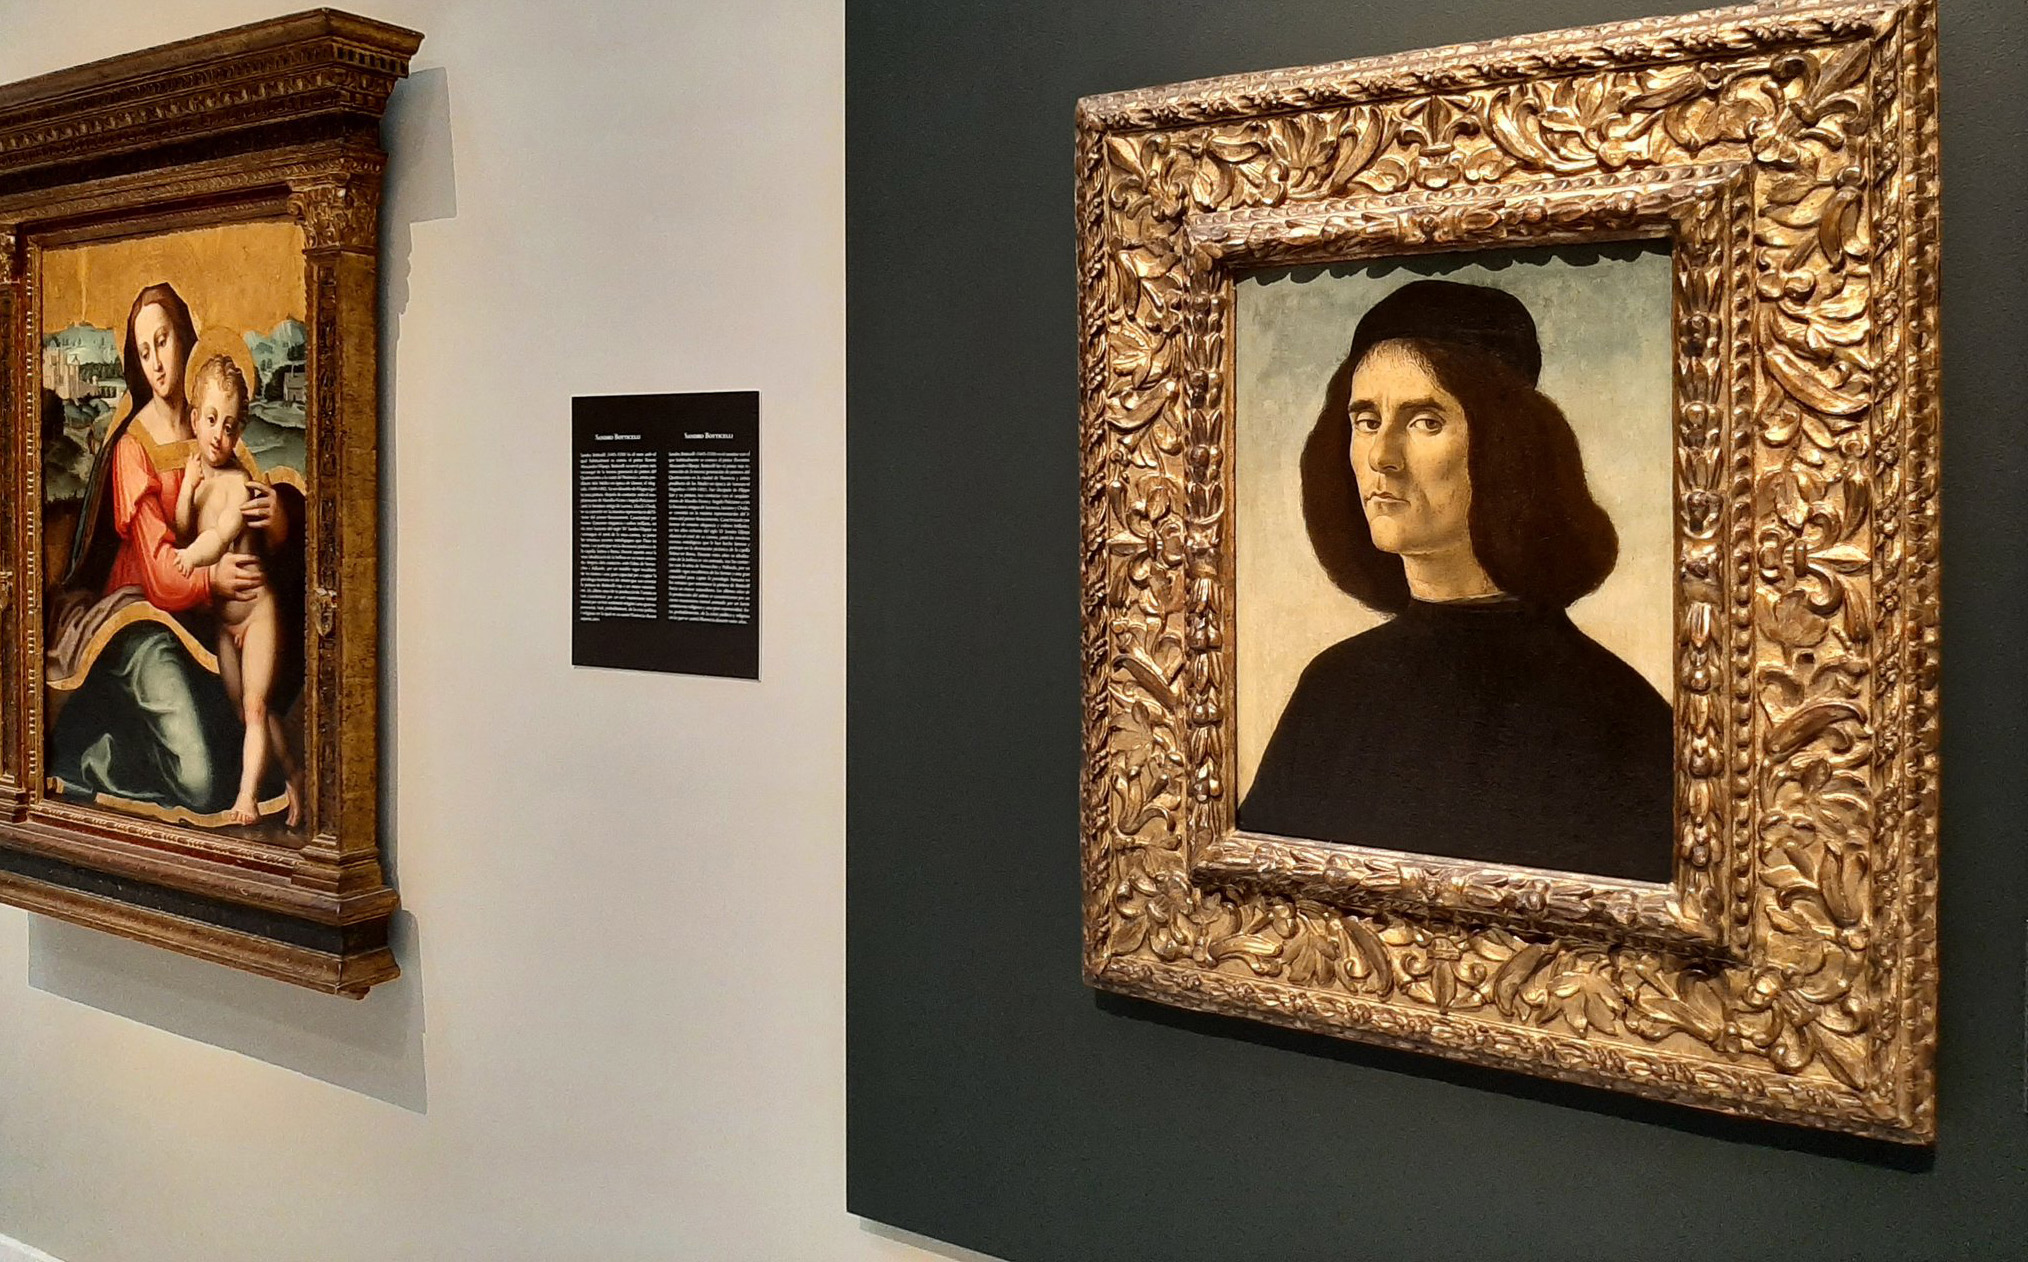 'Retrato de Michele Marullo Tarcaniota' de Sandro Botticelli.